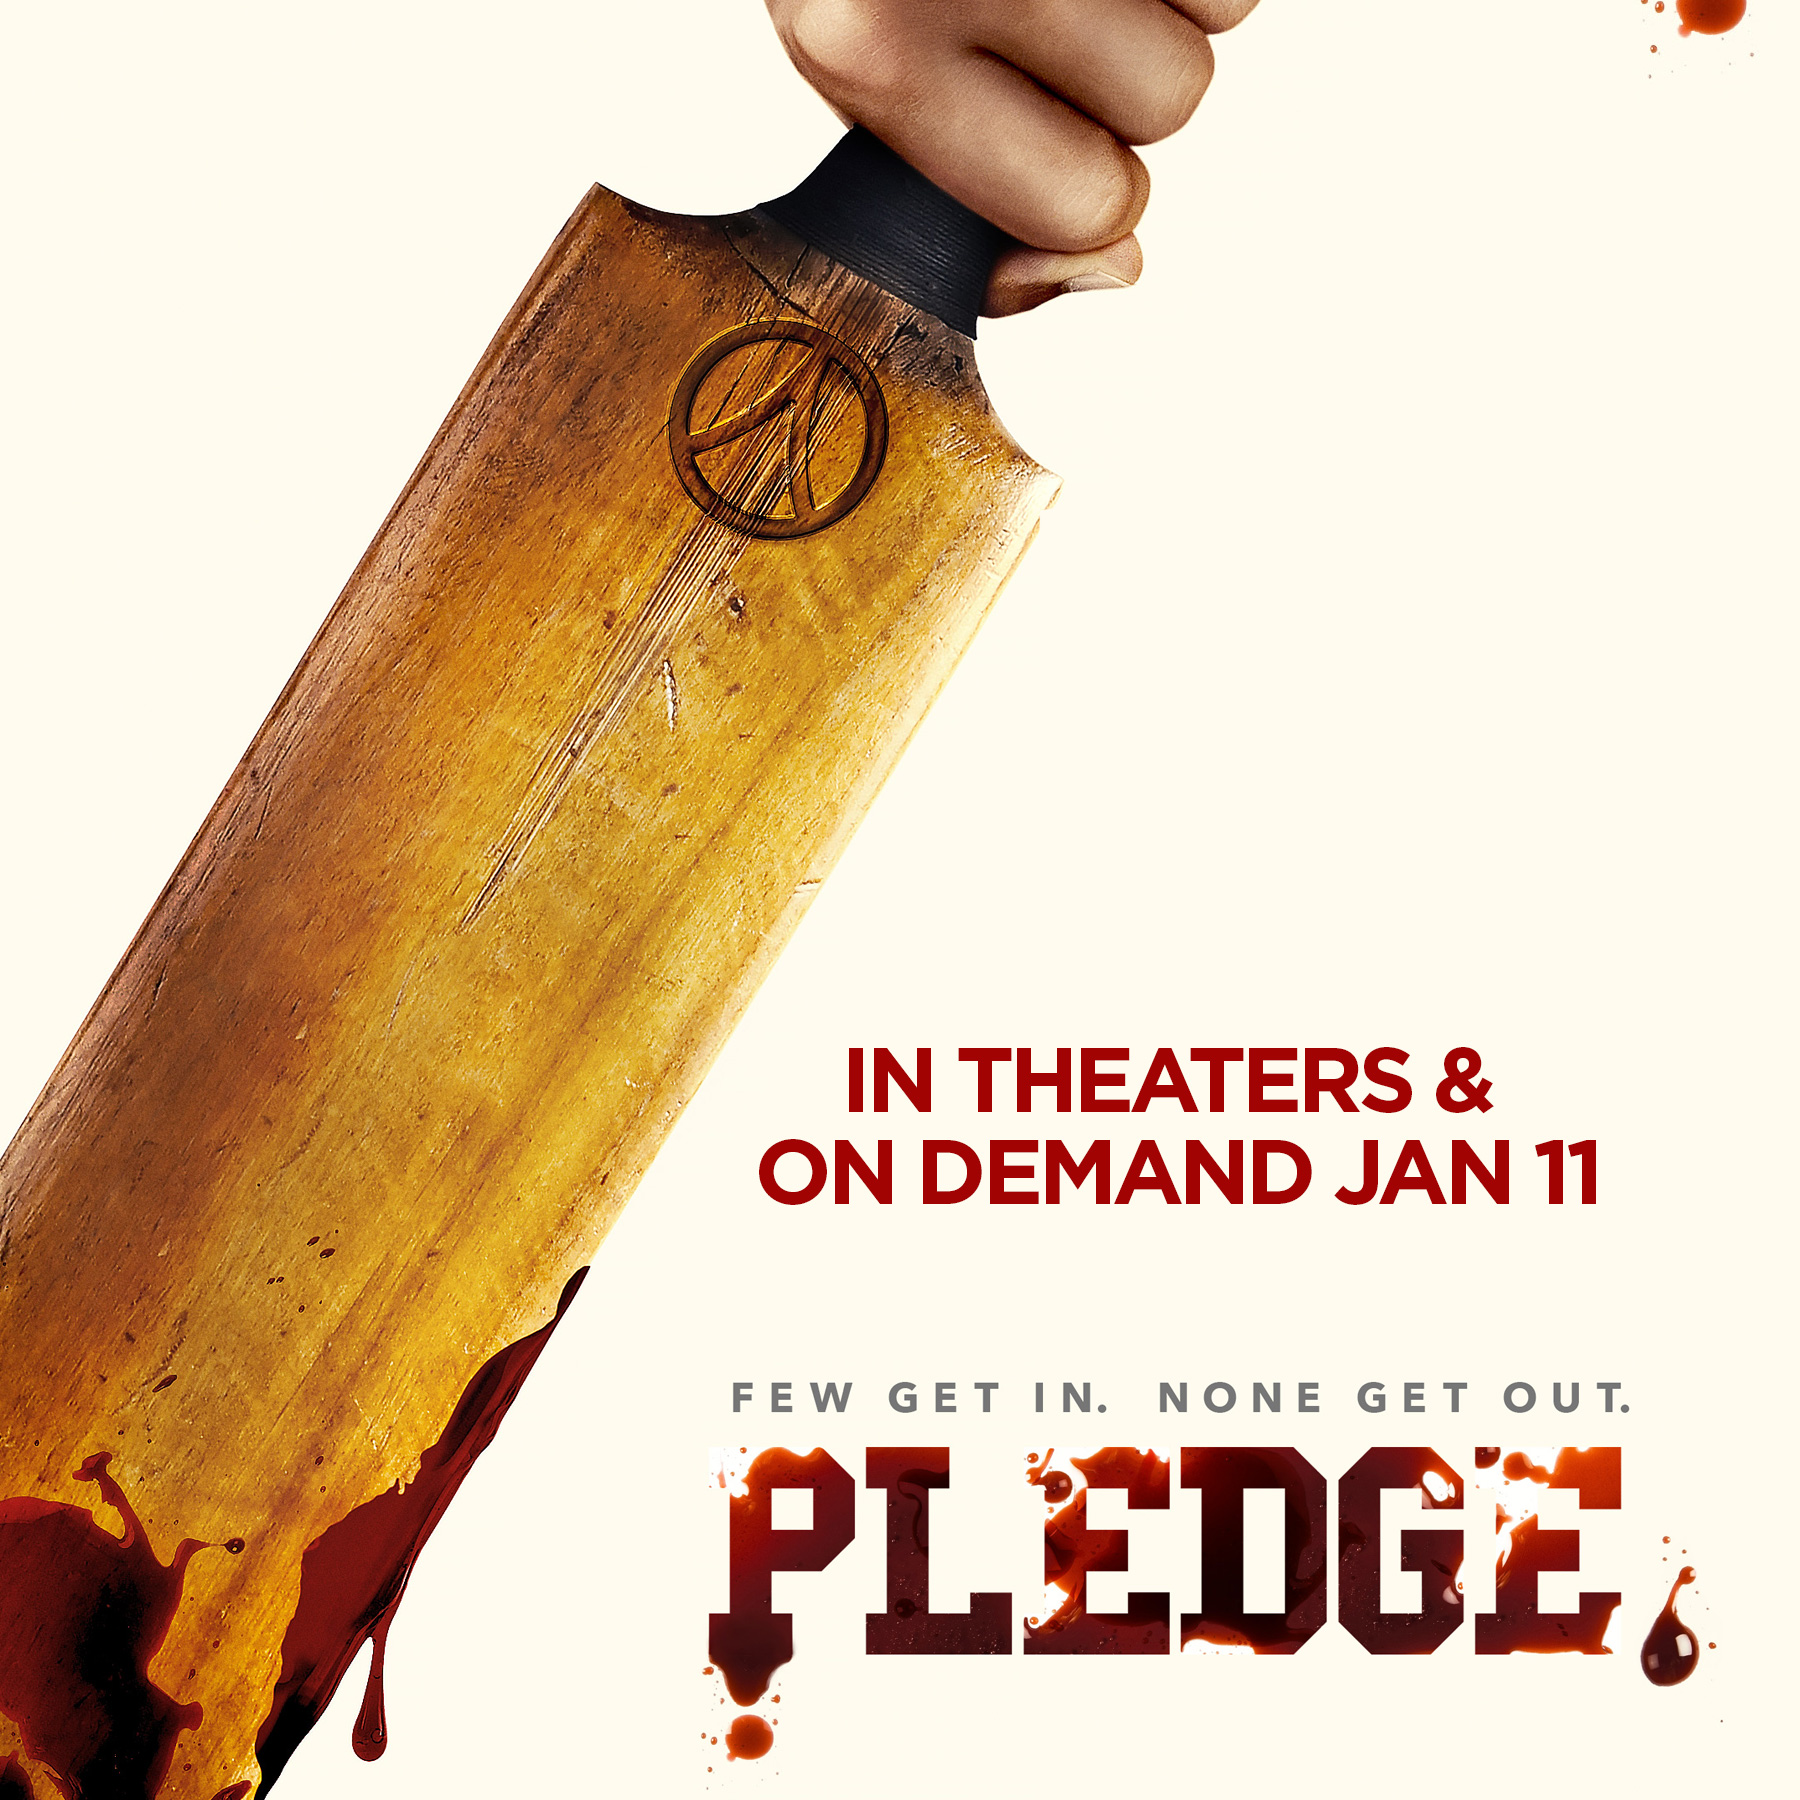 Pledge_ComingSoon_v3_1800x1800.jpg